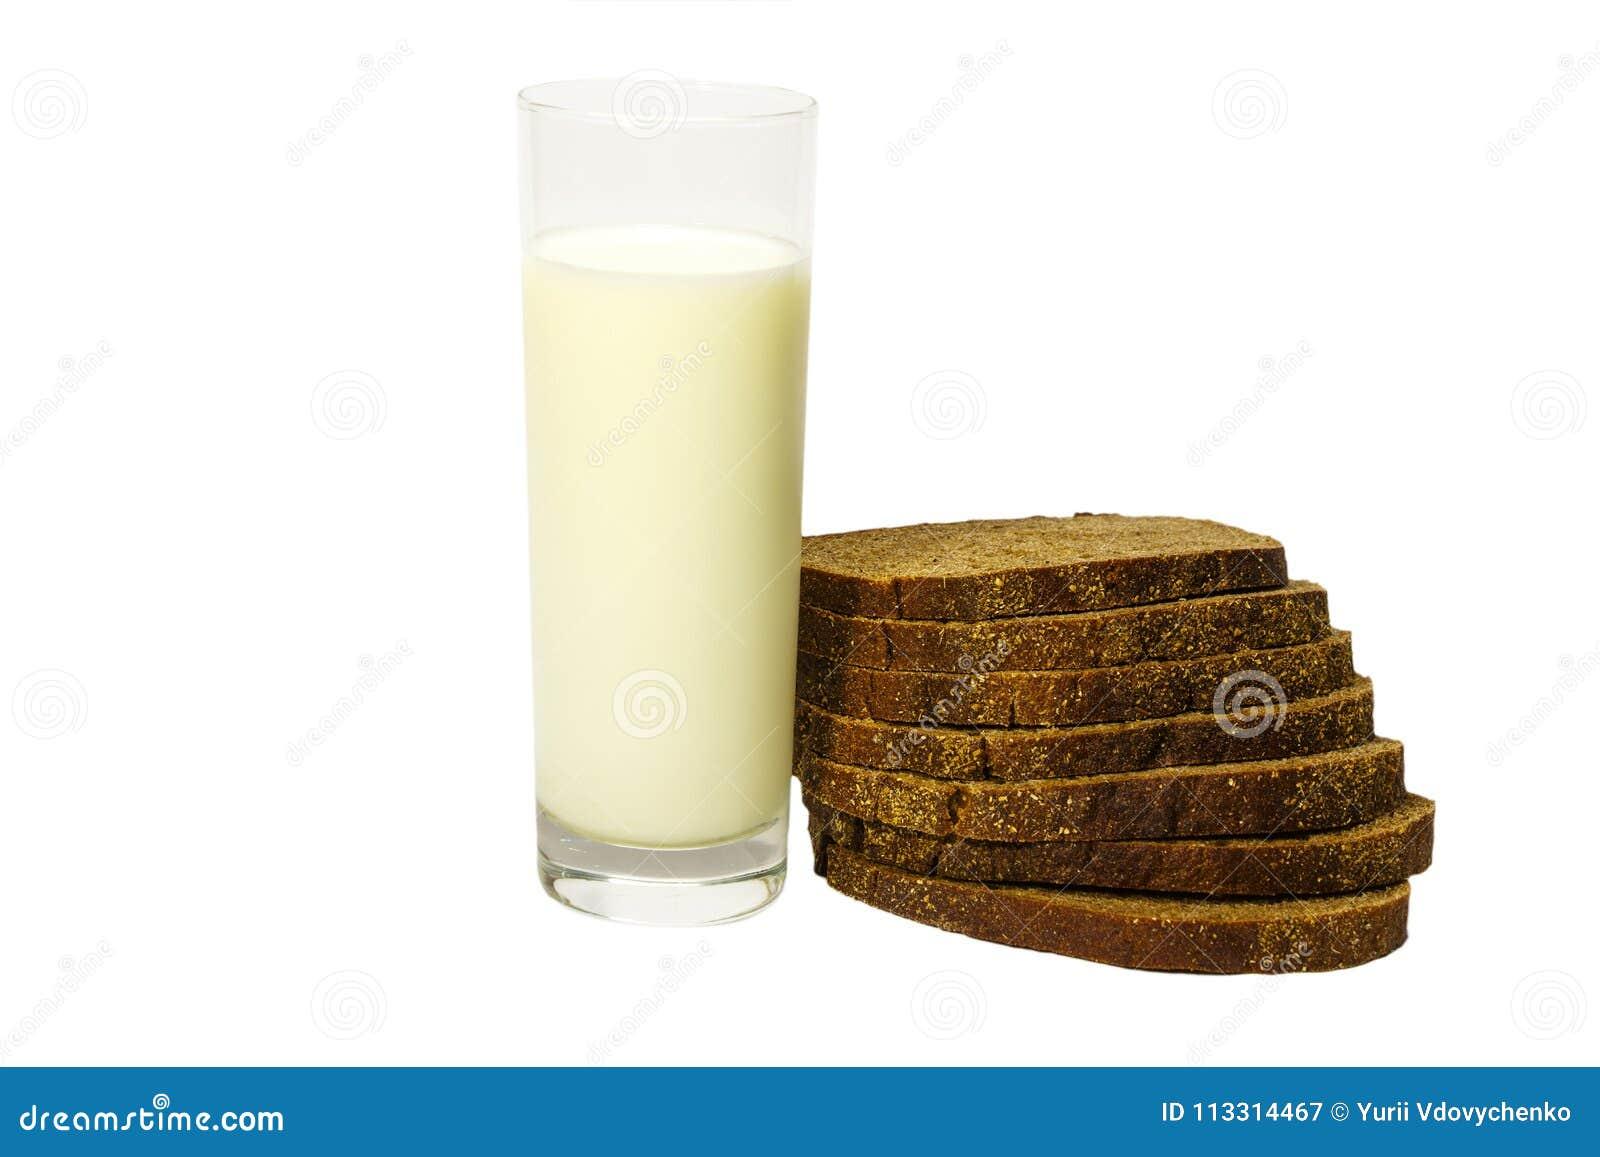 Mjölka i ett glass nytt som paras med skivat?? rågbröd bakgrund isolerad white